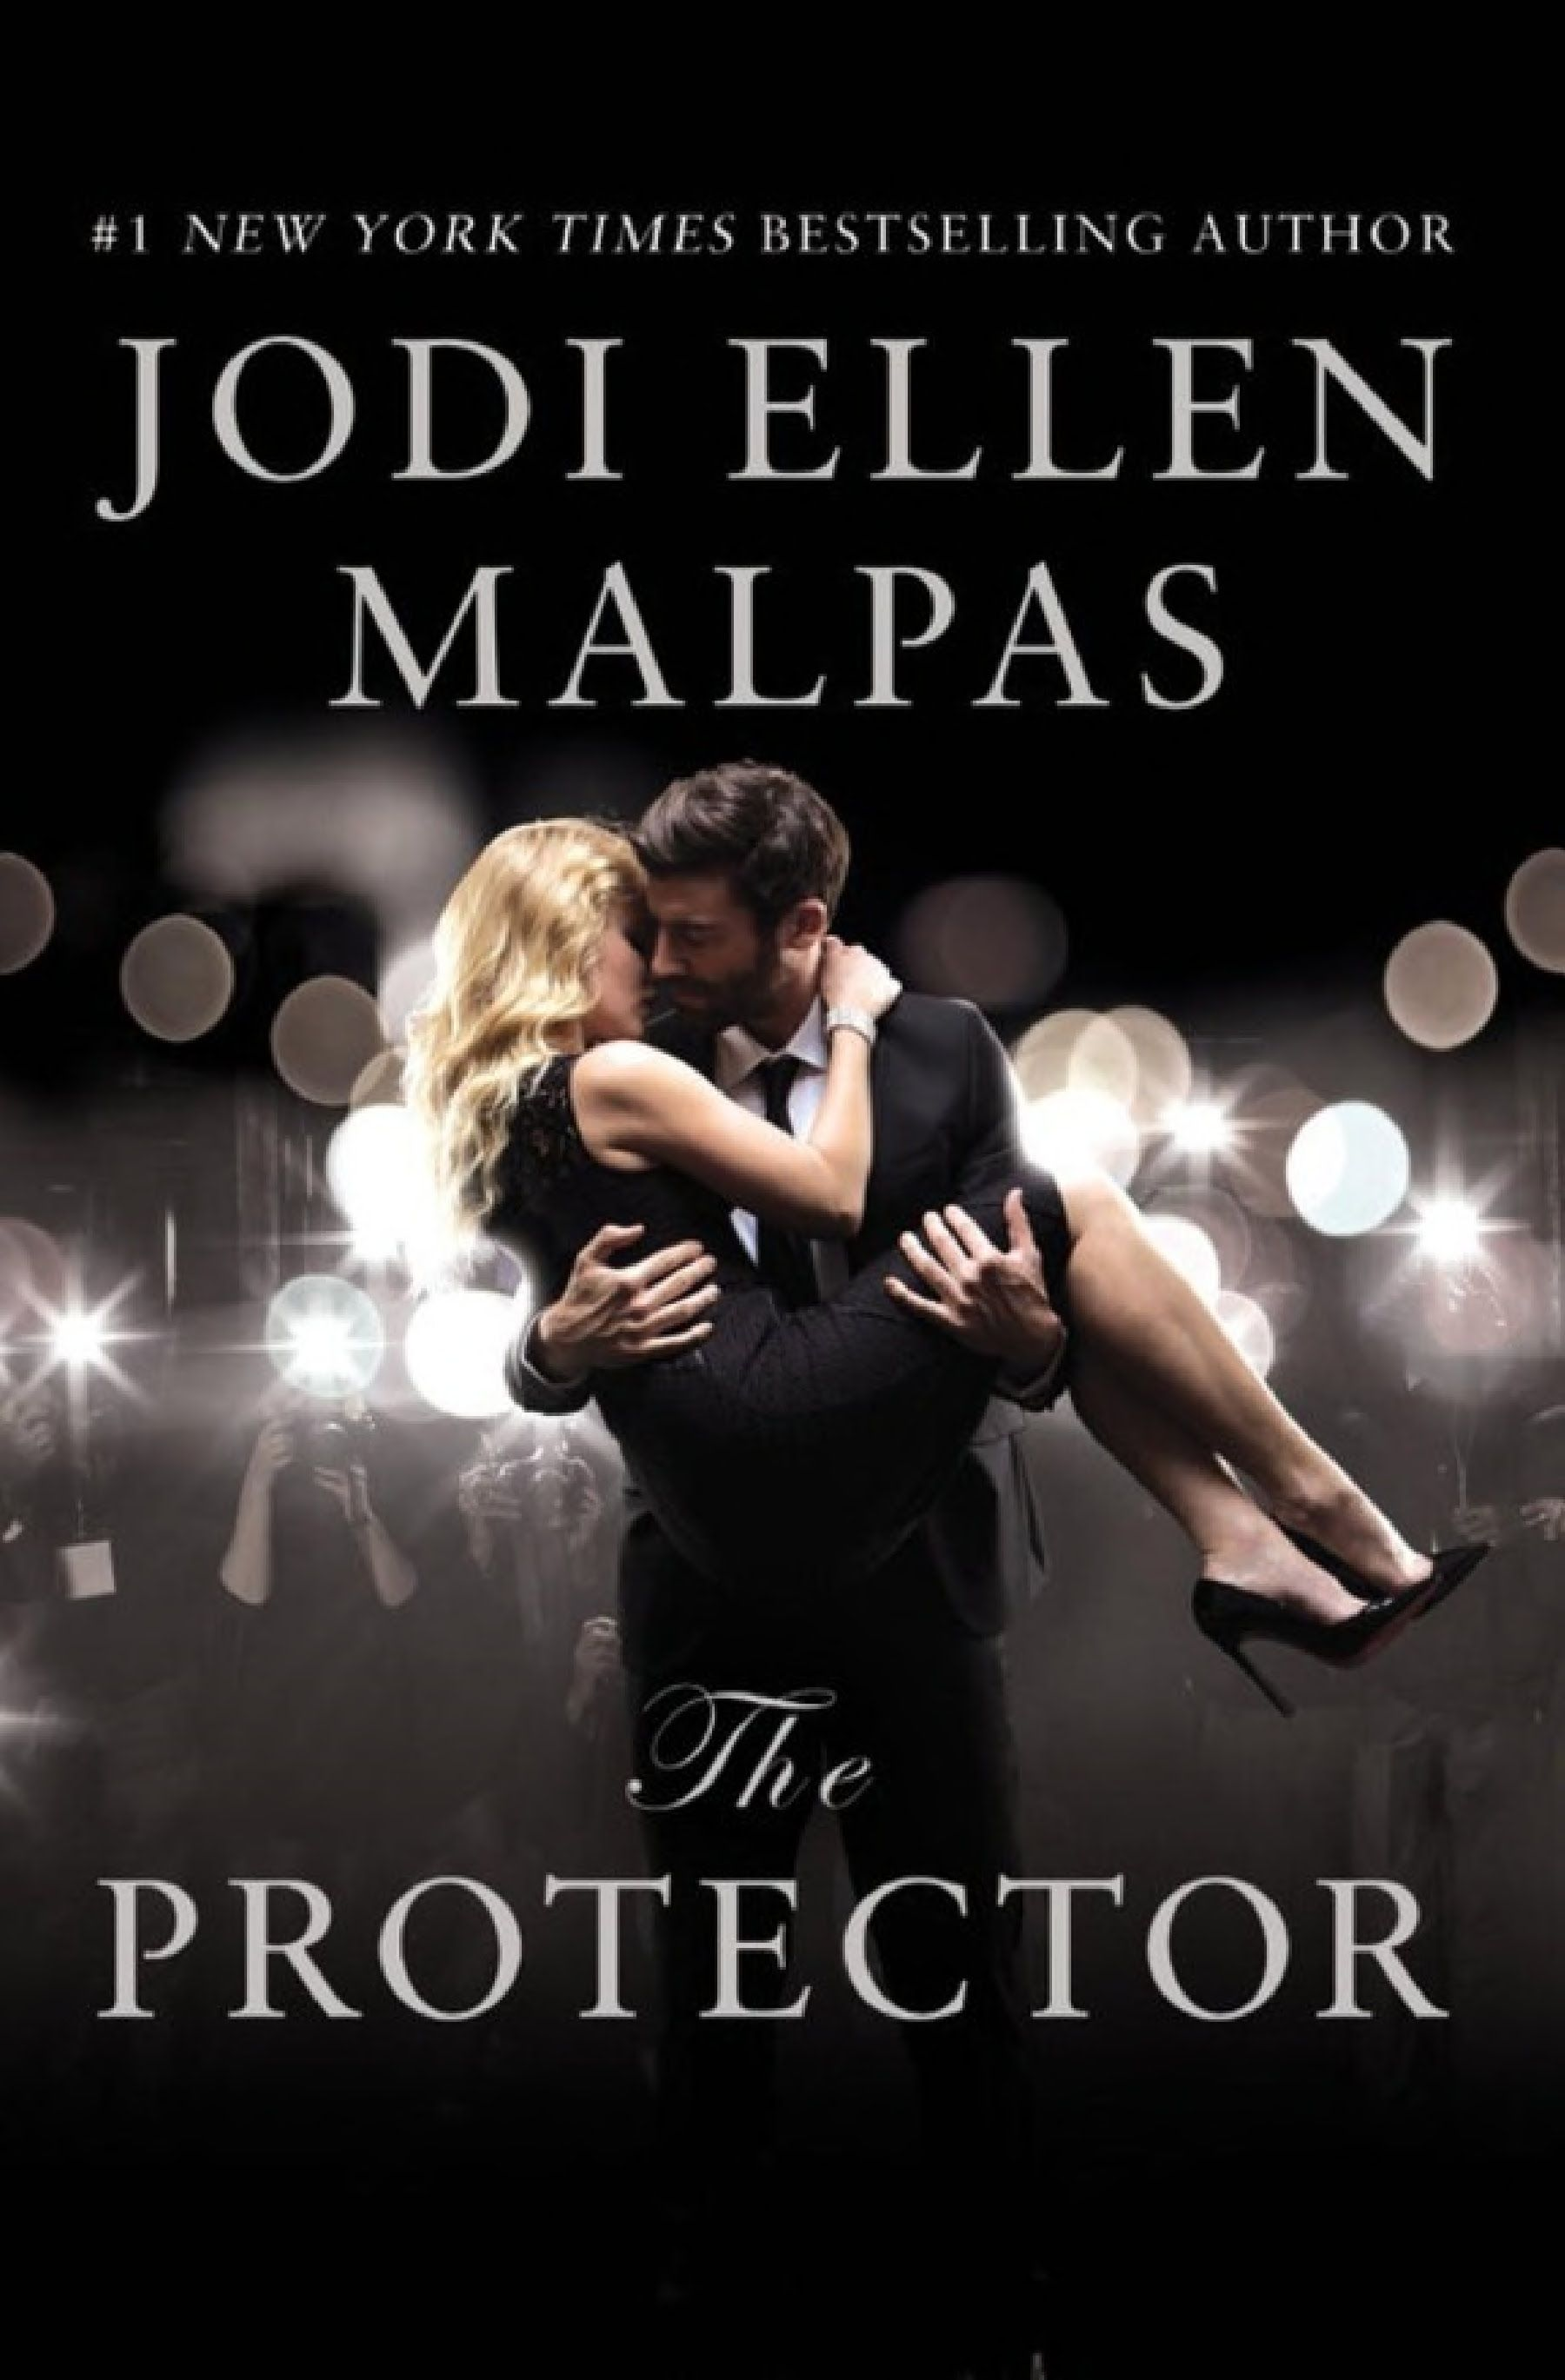 Ebook The Protector libro electrónico descargar PDF ...